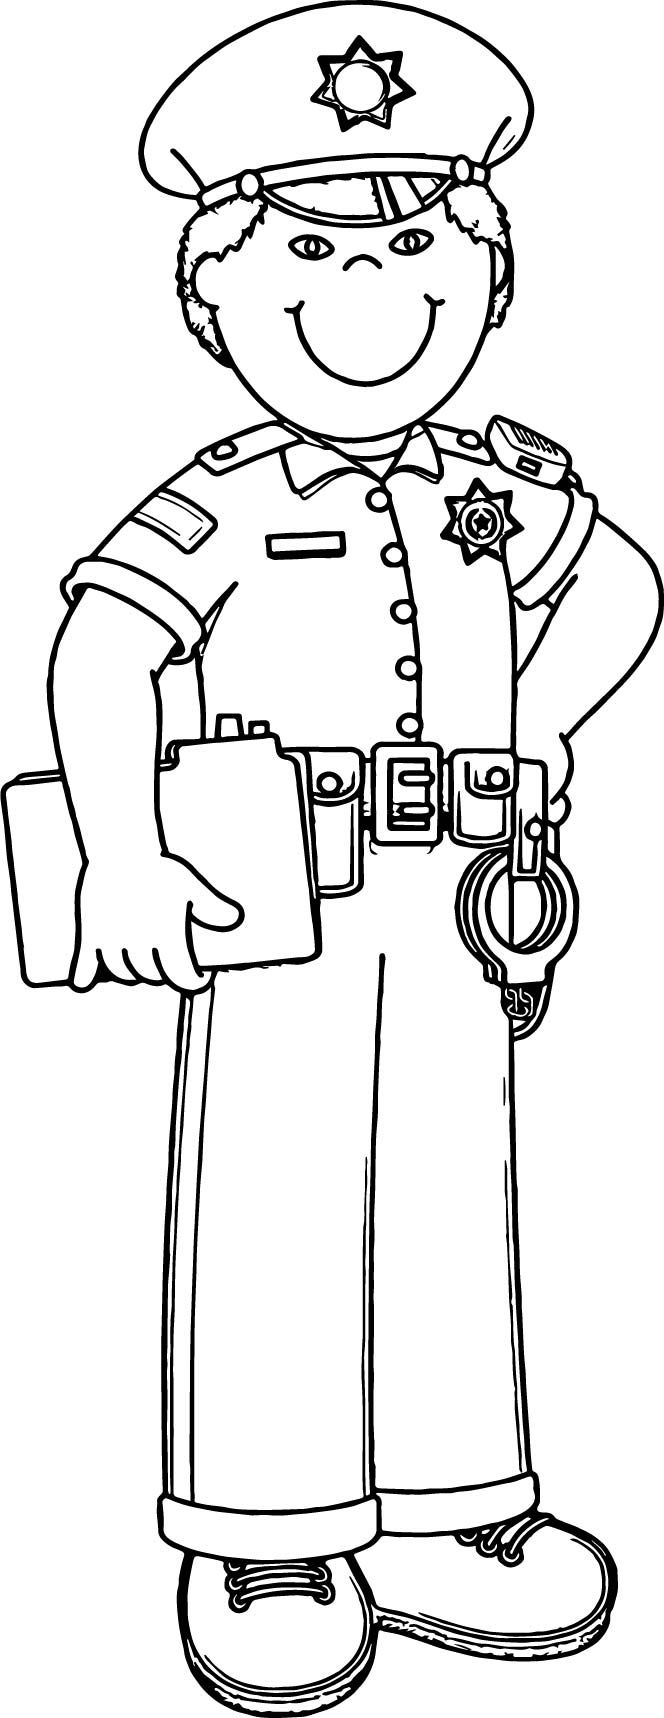 Nice Policeman Coloring Pages Community Helpers Preschool Crafts Coloring Pages Community Helpers Preschool